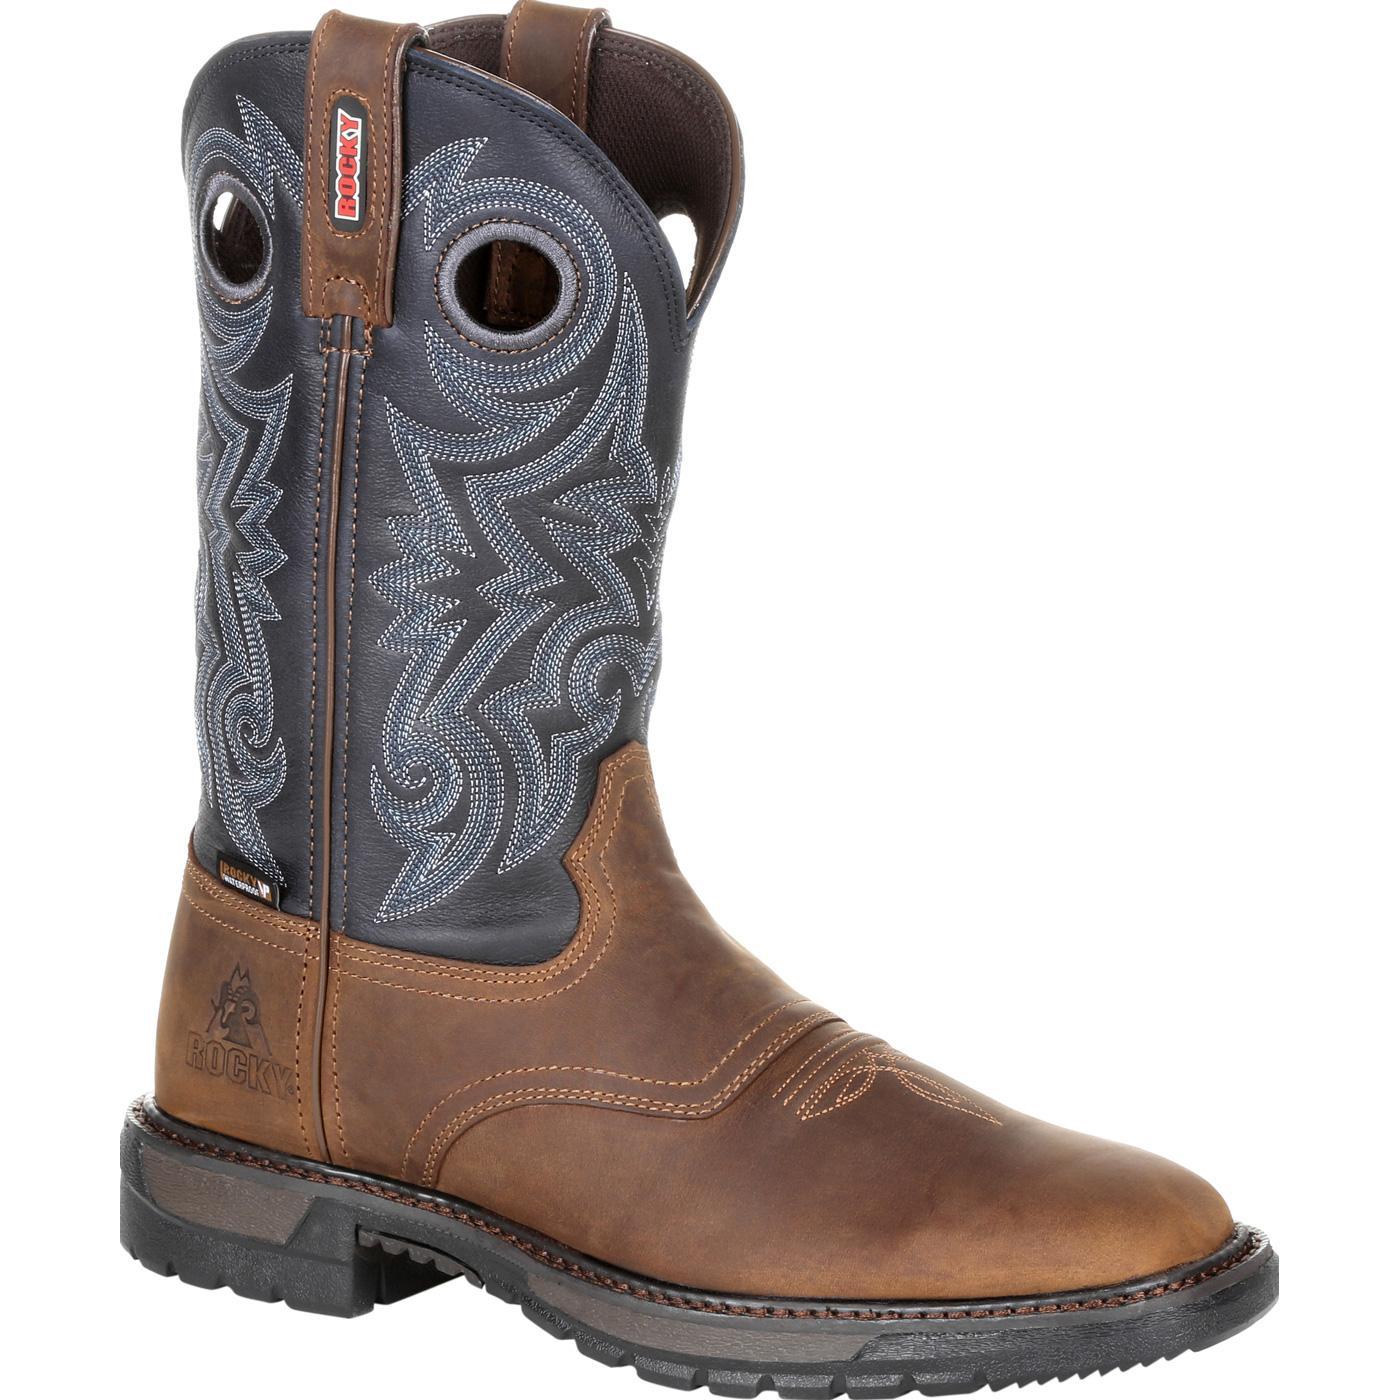 8f1f4f5c64e Rocky Original Ride FLX Waterproof Western Boot